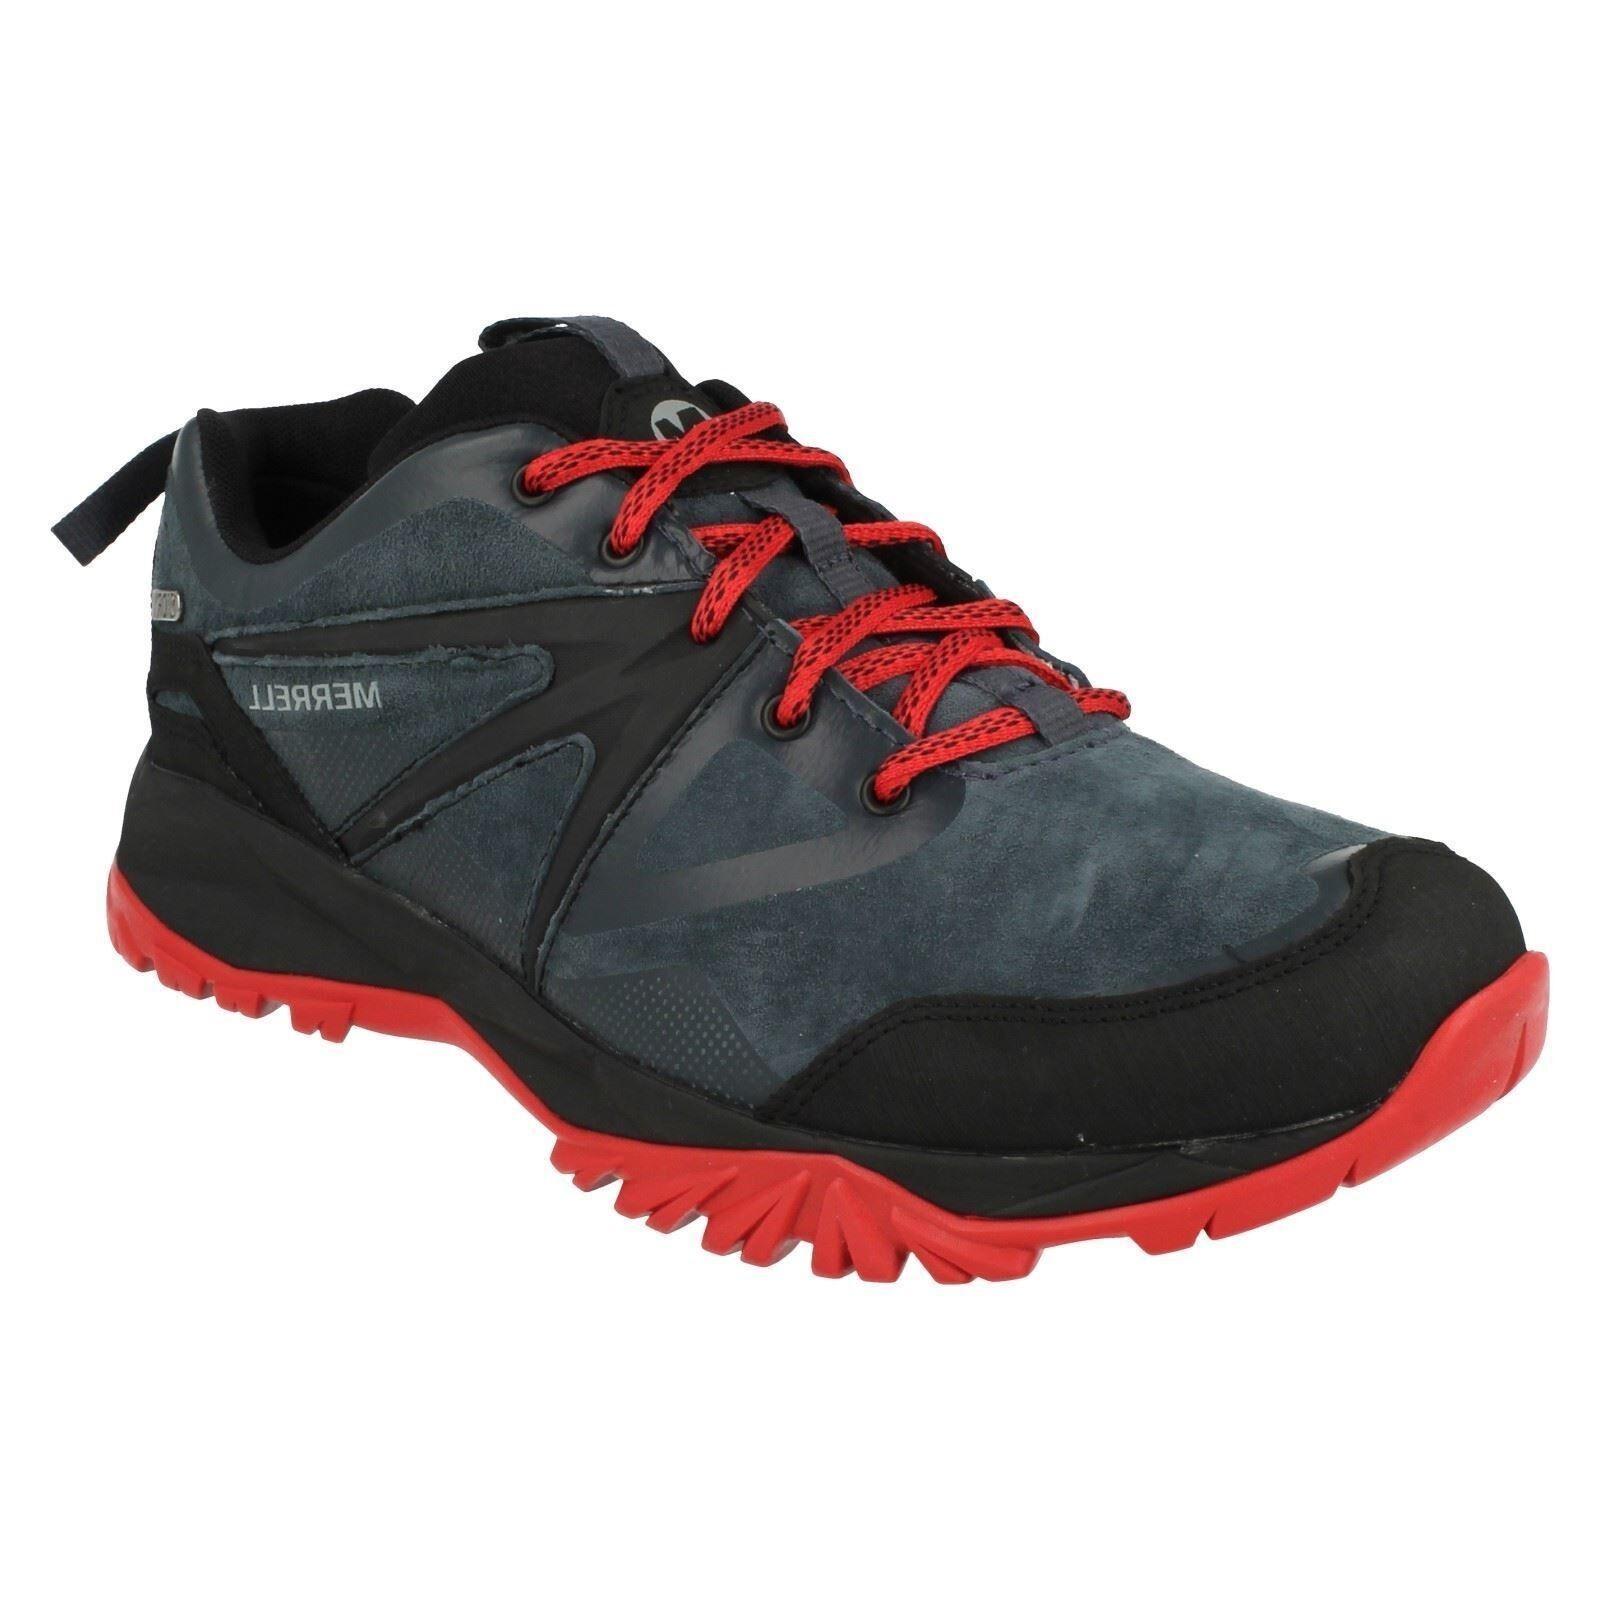 Merrell para hombre Capra Bolt Caminar Cuero Con Cordones Para Caminar Bolt Impermeable 12ee89